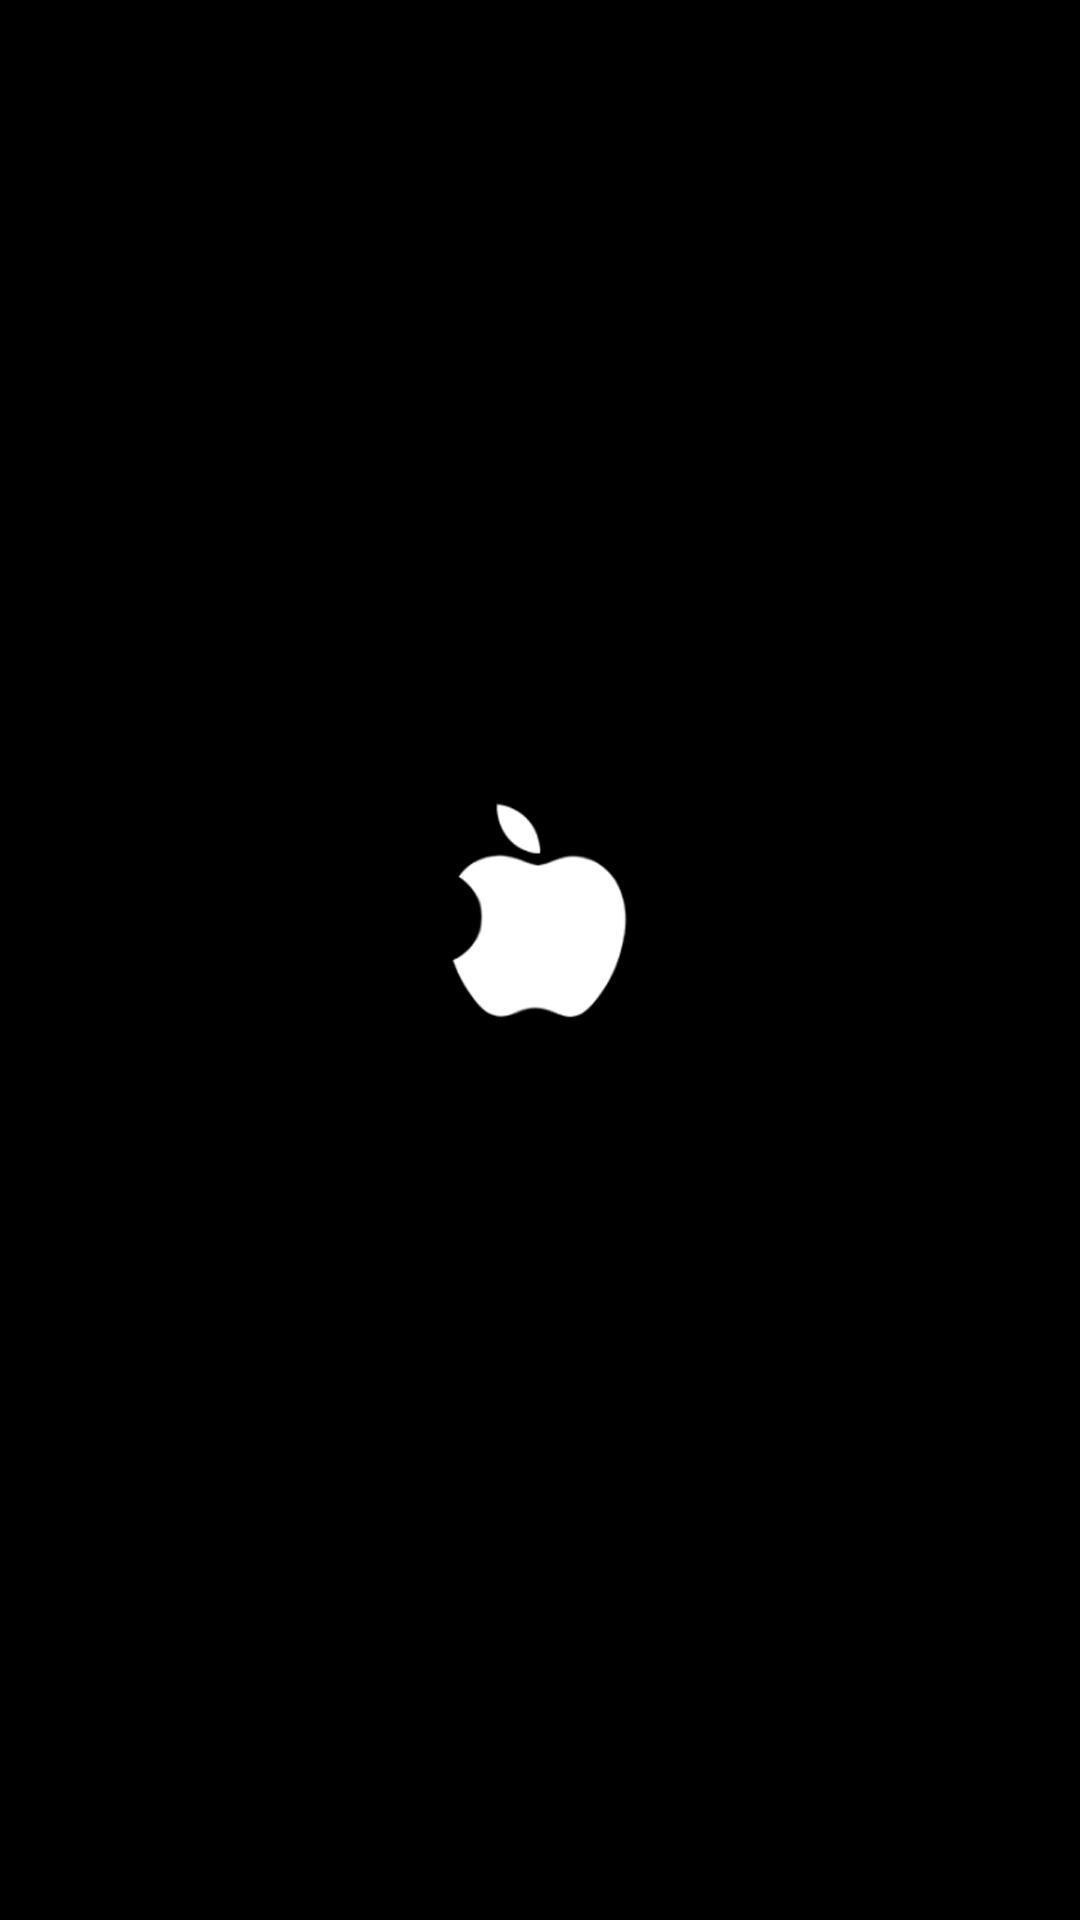 Wallpaper Black Apple For Iphone 7 2020 3d Iphone Wallpaper